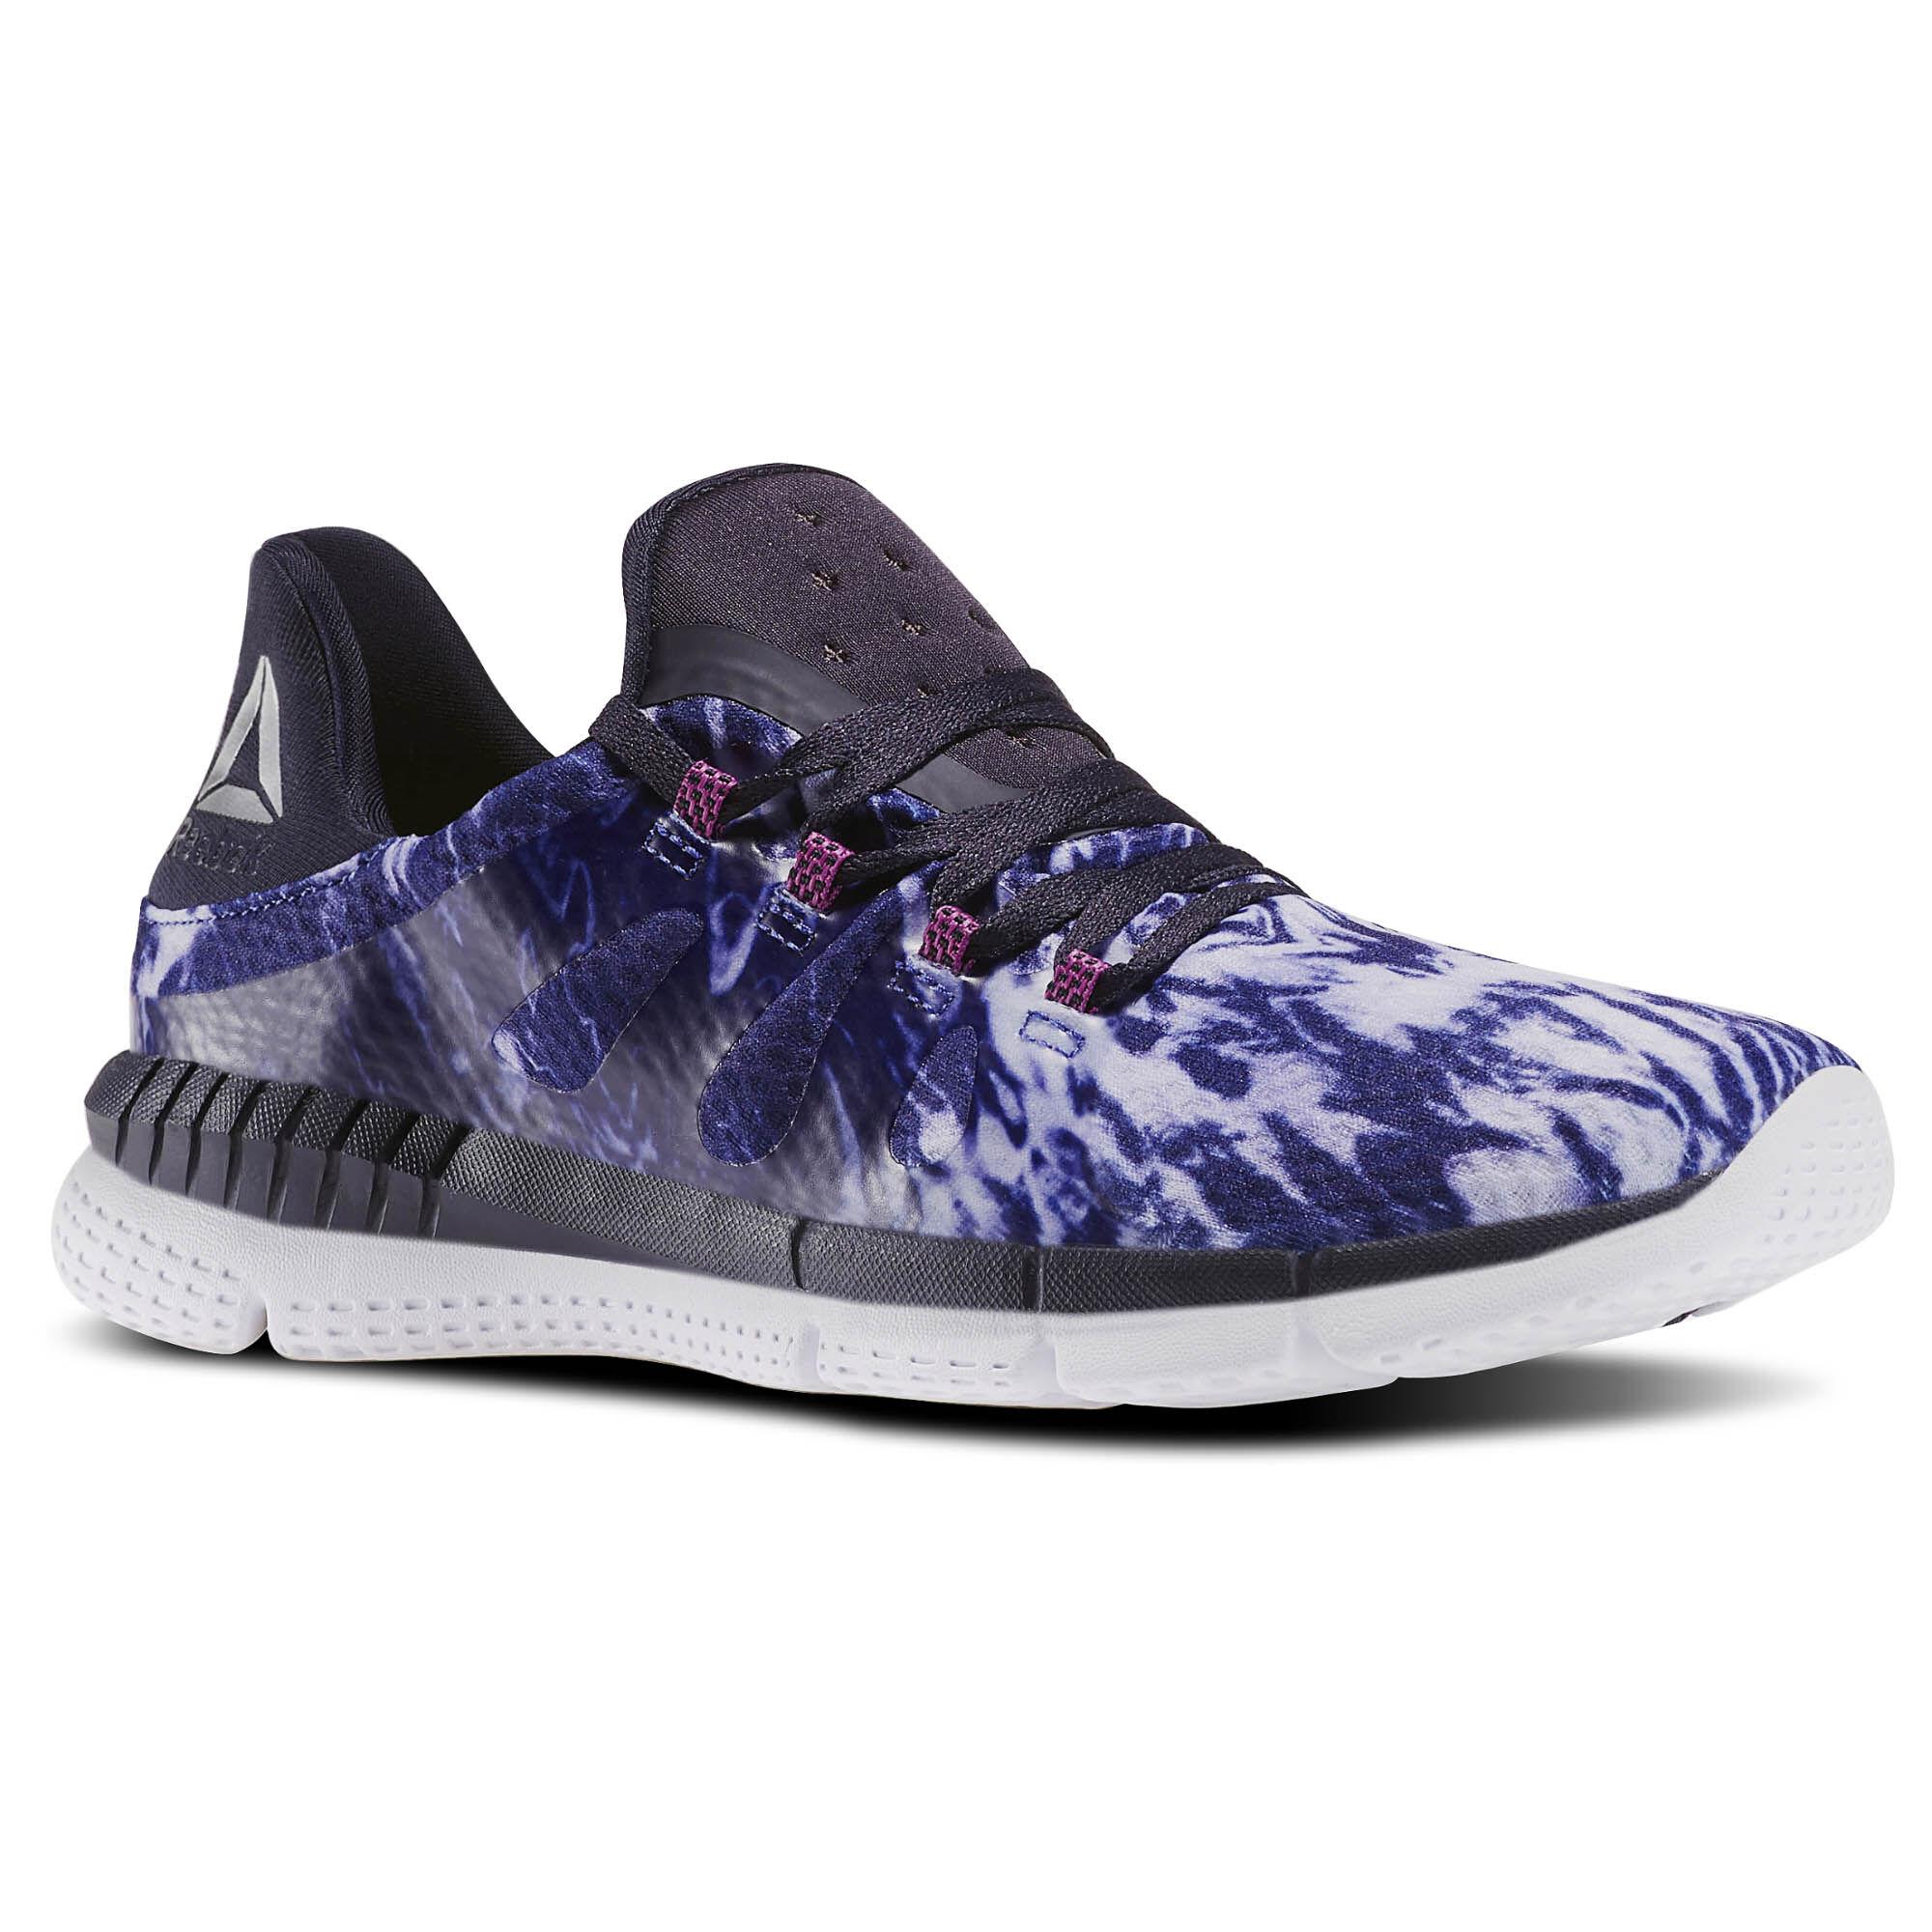 f5bbcb132ec reebok purple sneakers cheap   OFF55% The Largest Catalog Discounts